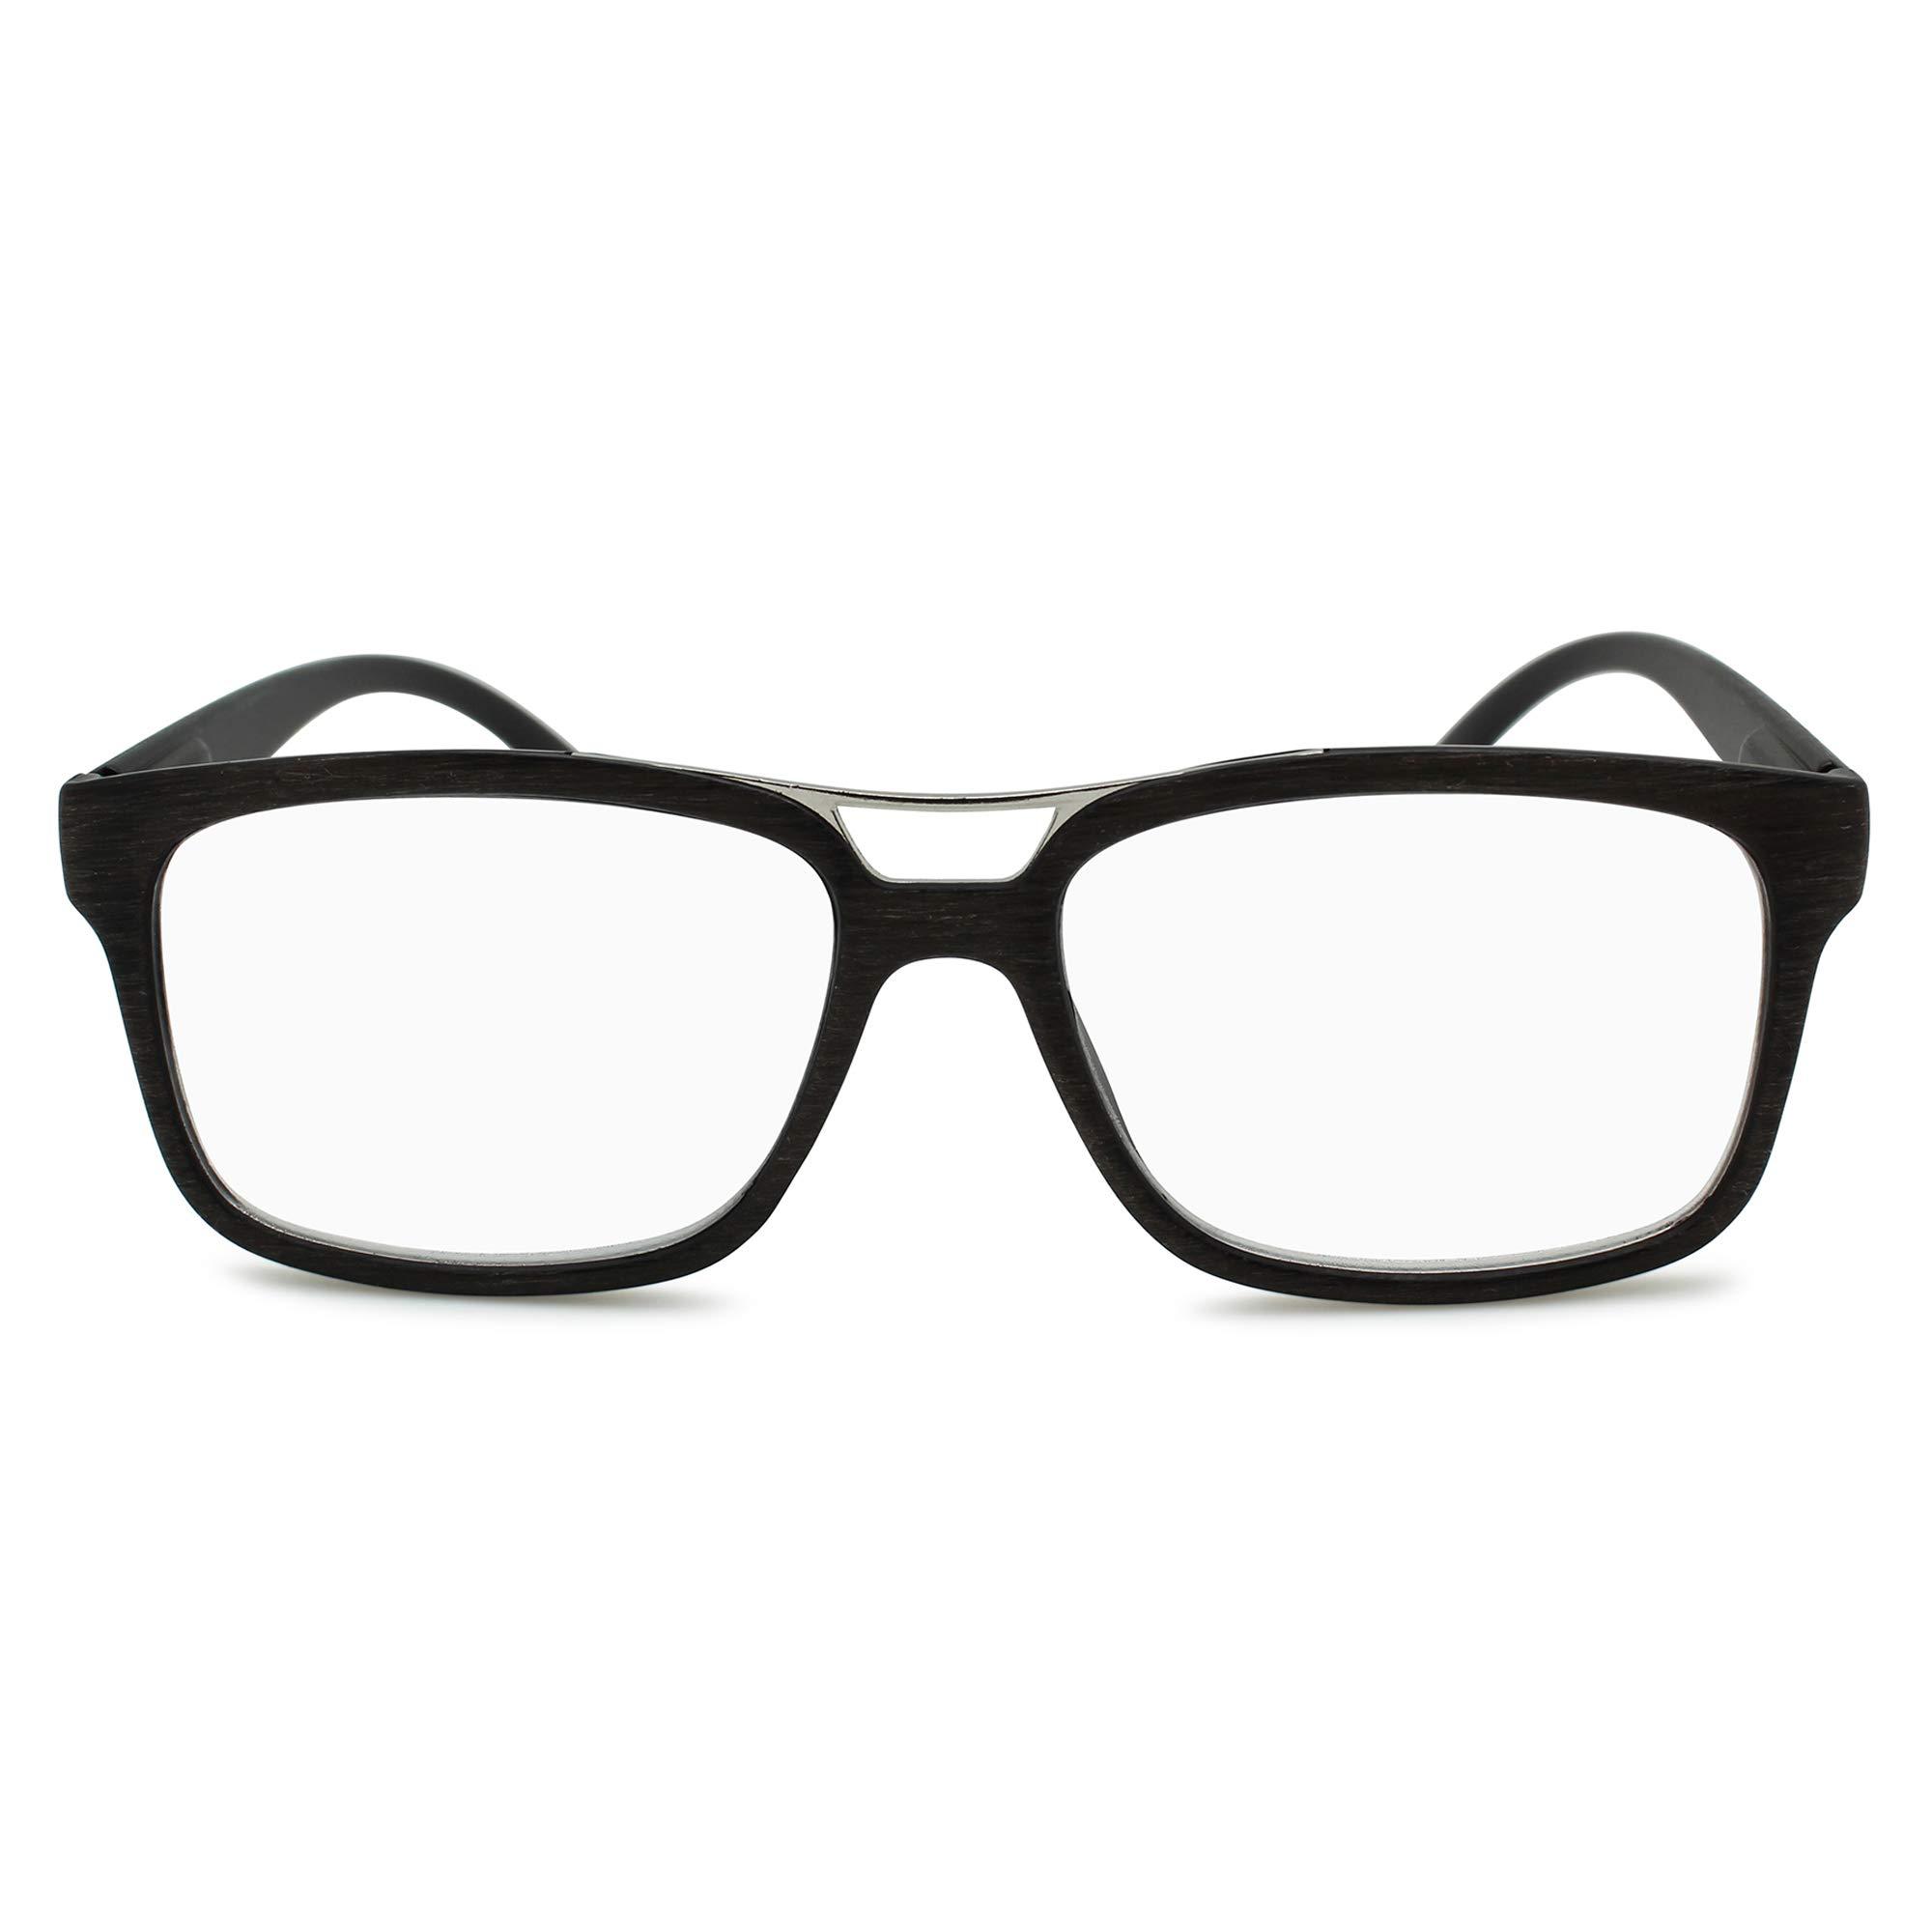 2SeeLife Men's Reading Glasses: Metal Bar Rectangular Readers, Faux Woodgrain Eyeglass Frame with Fully Magnified Lenses | Dark Brown, 1.50